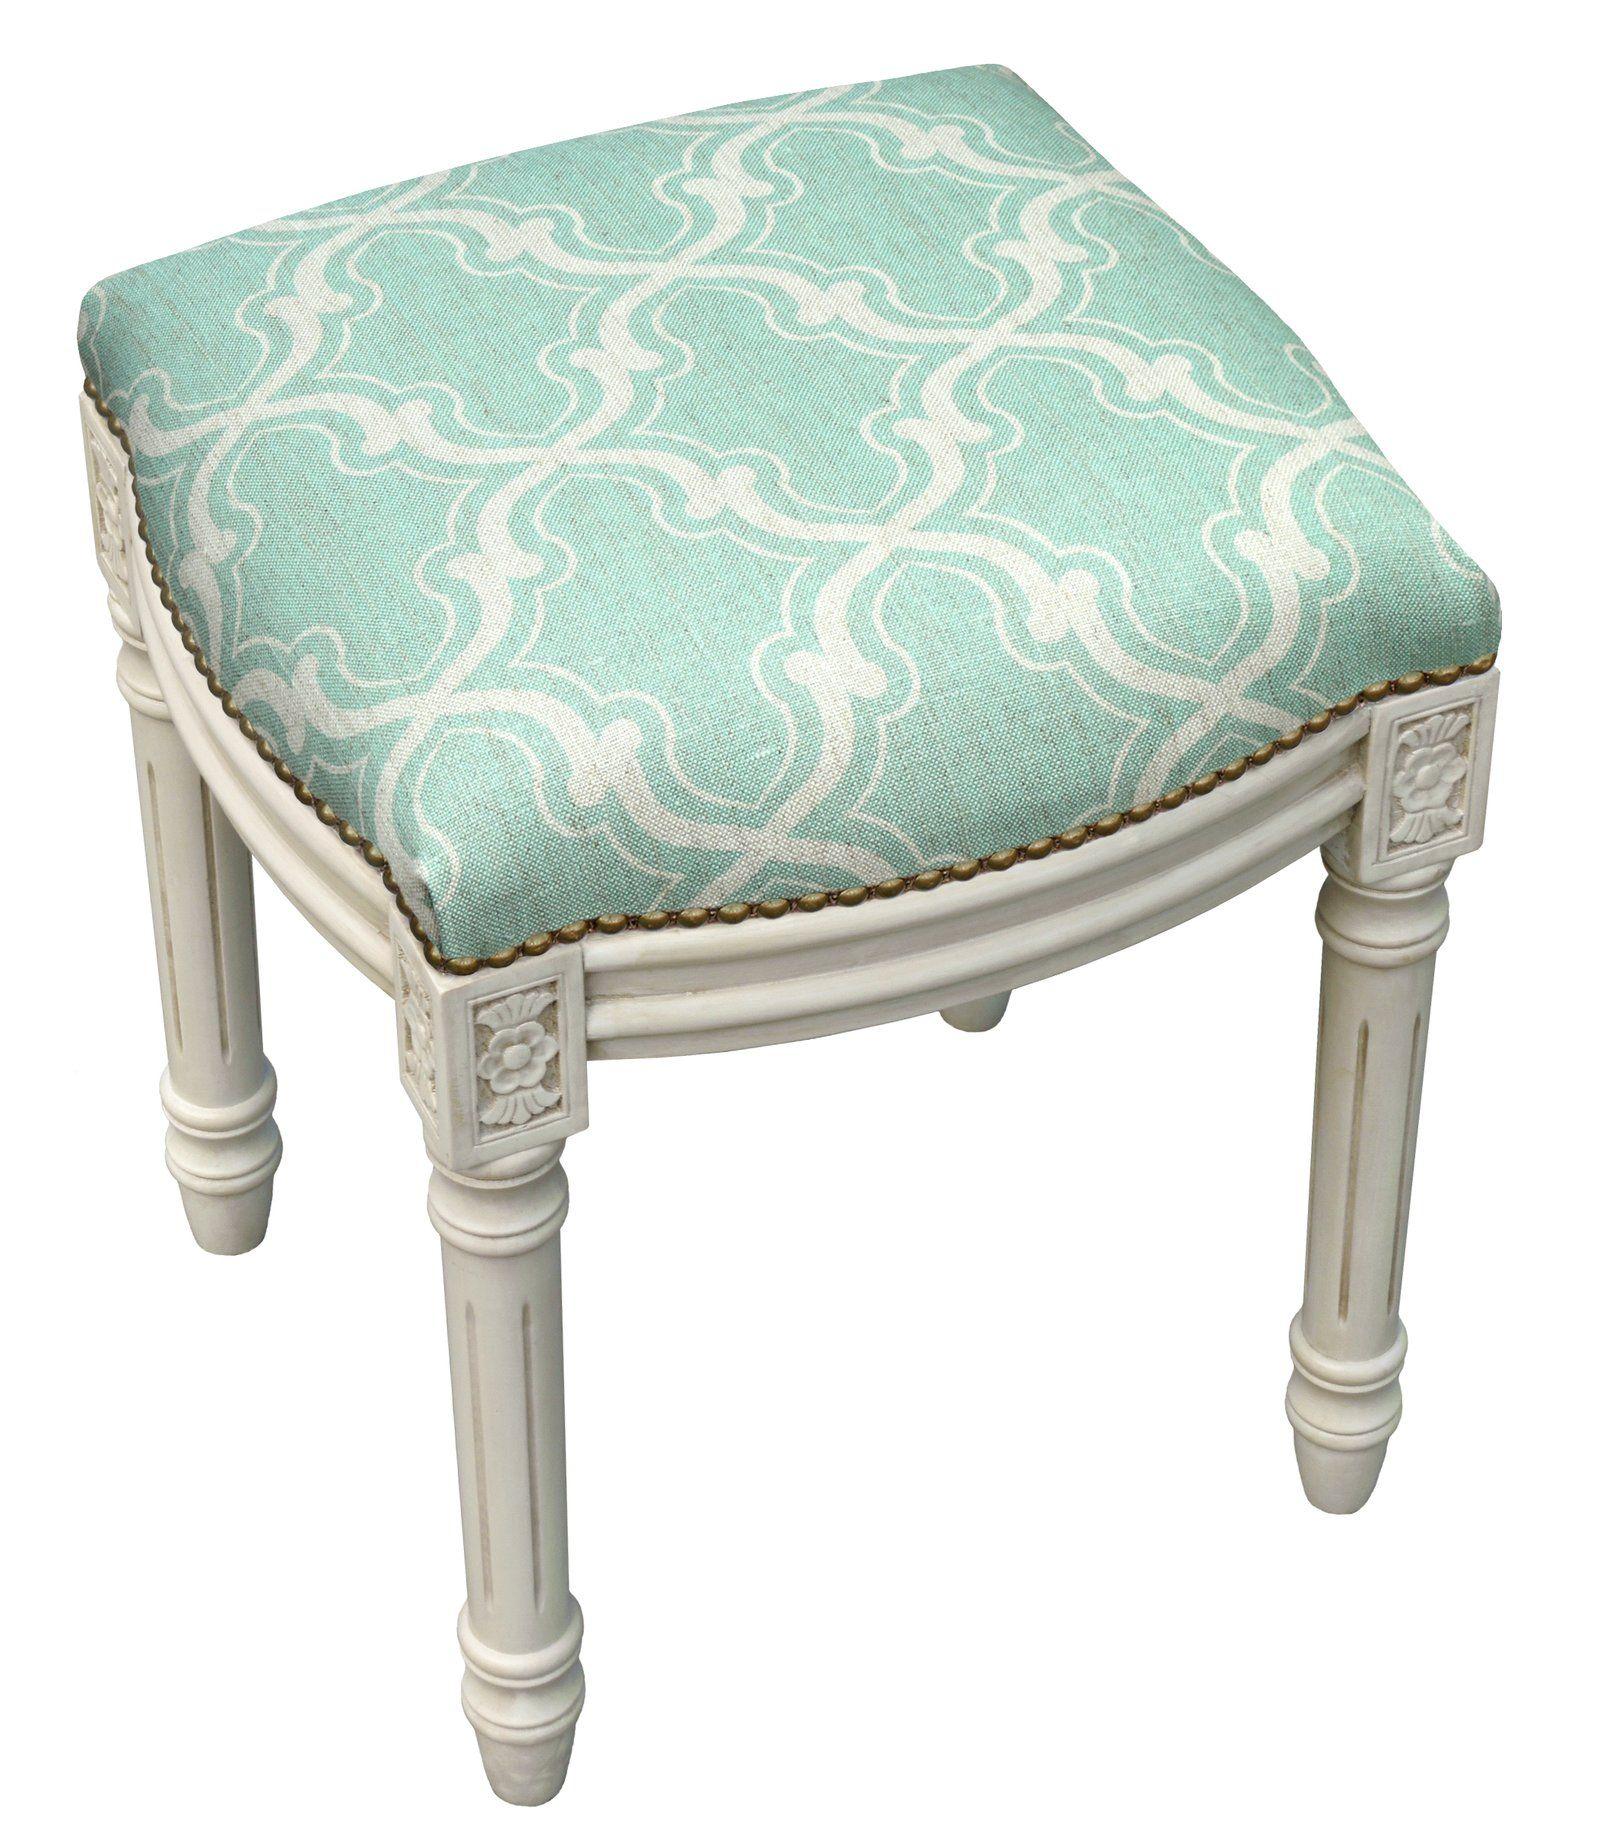 Trellis Linen Upholstered Vanity Stool Vanity Stool Vanity Seat